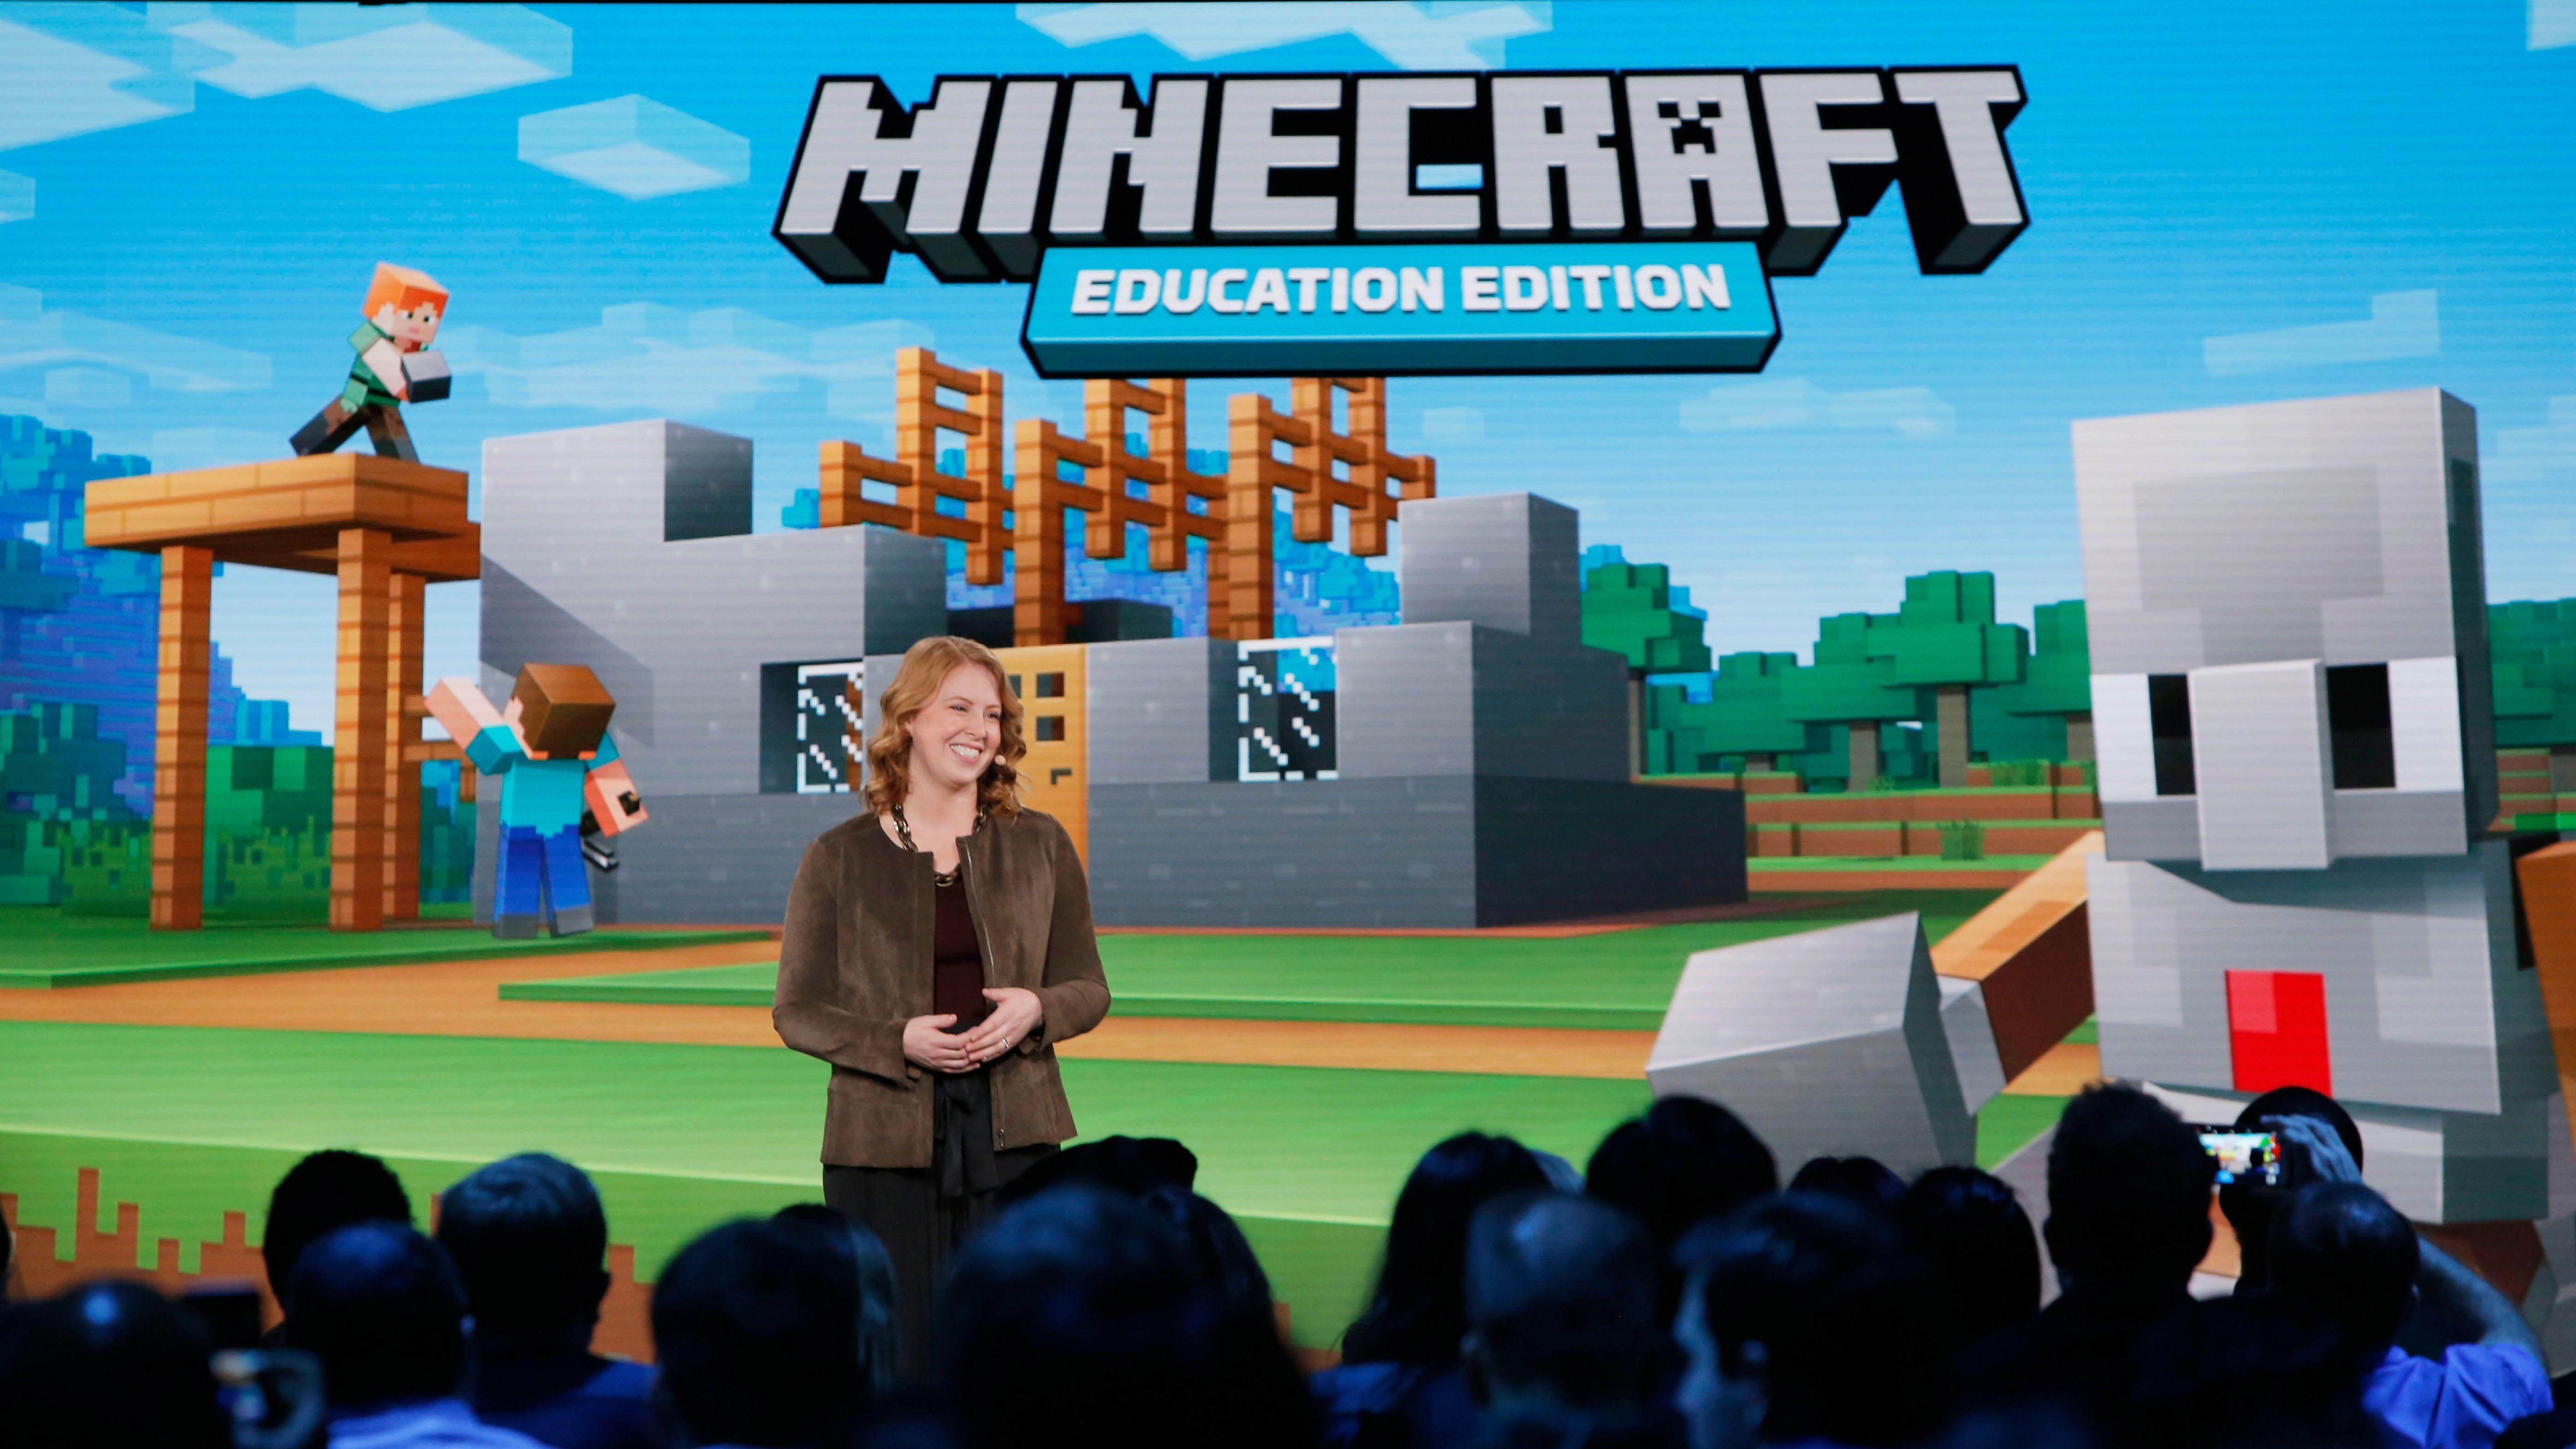 Microsoft releases Minecraft: Education Edition for the iPad — Quartz